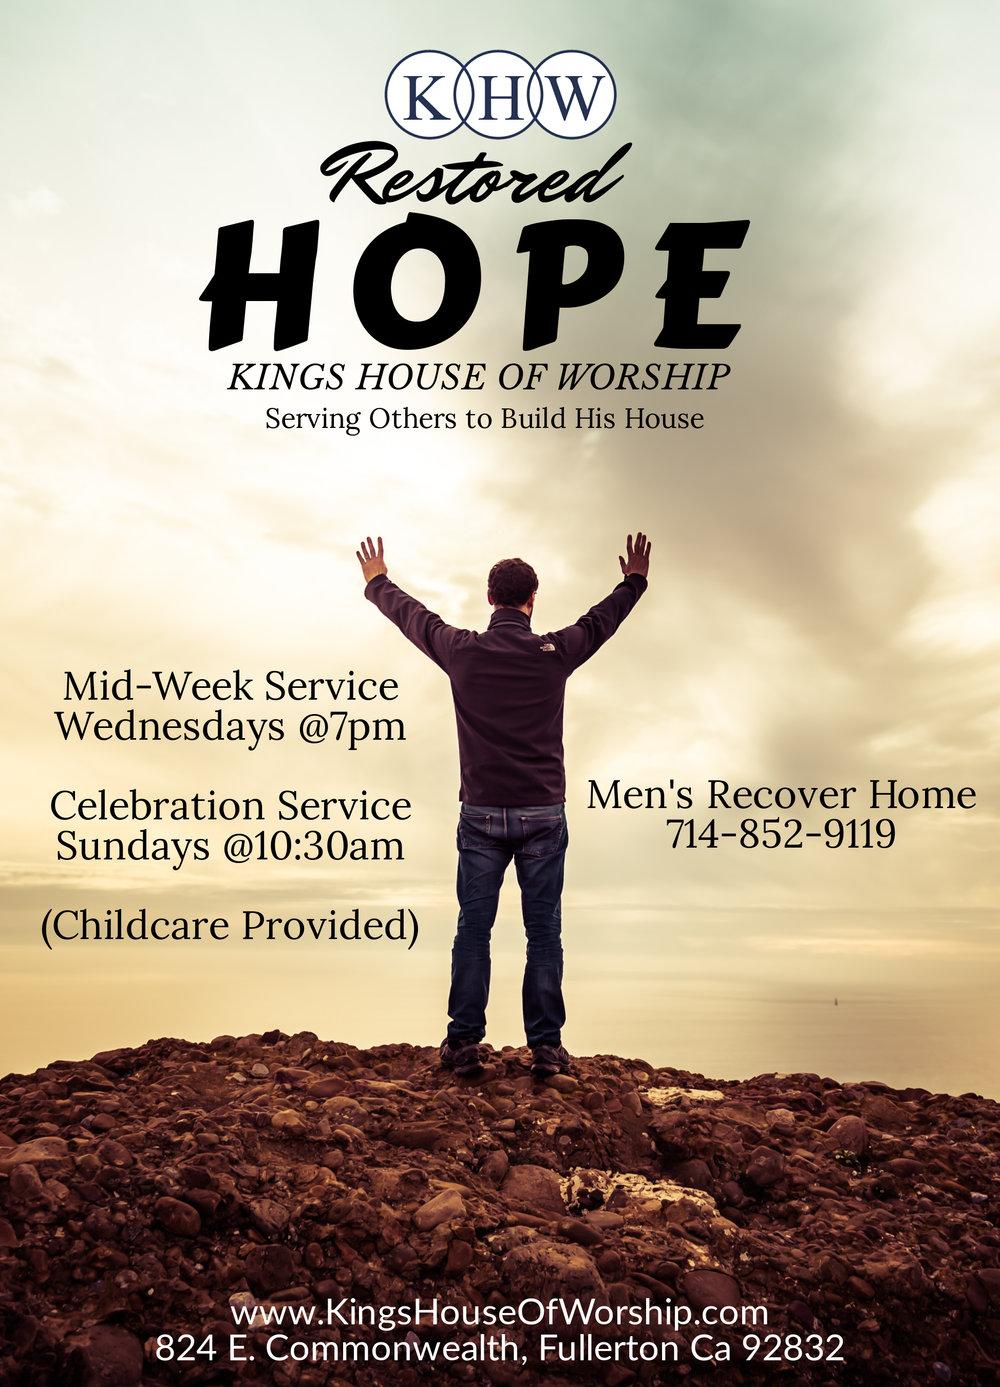 About - ServicesSunday Morning:10:00 am prayer | 10:30 amWednesday Mid-Week:6:30 pm prayer | 7:00 pm